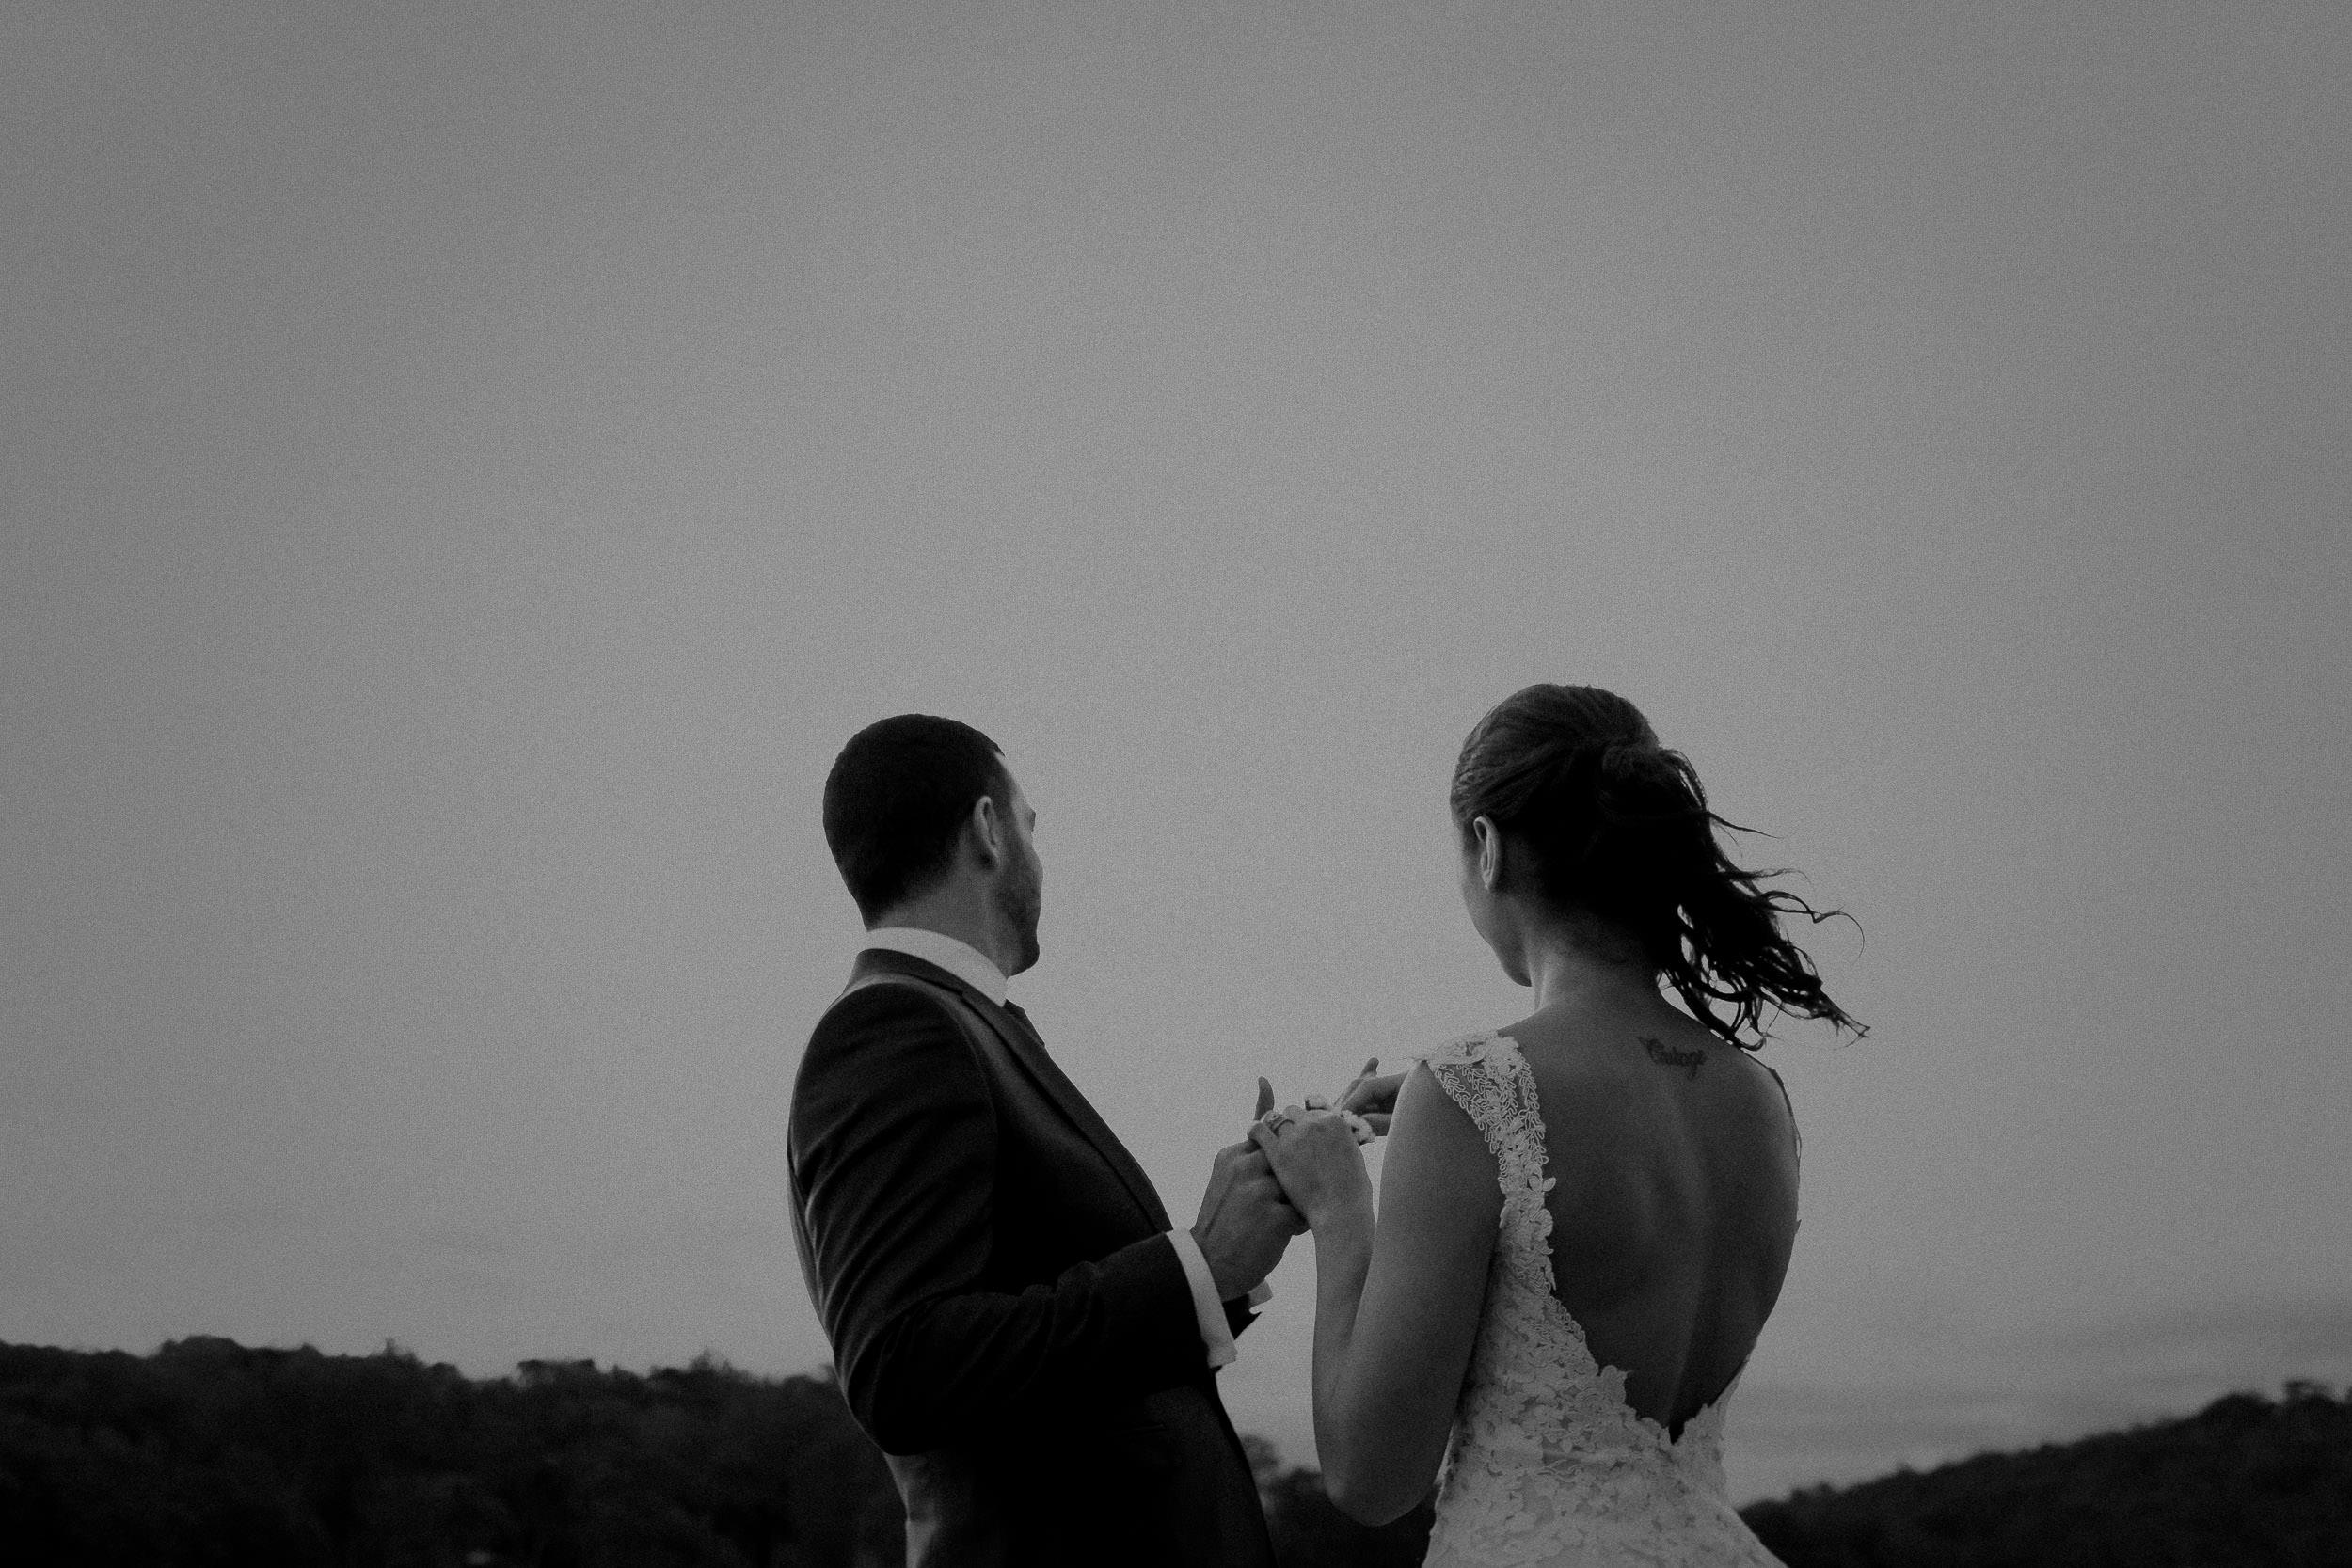 g_c wedding - kings _ thieves elopement wedding photography - blog 87.jpg